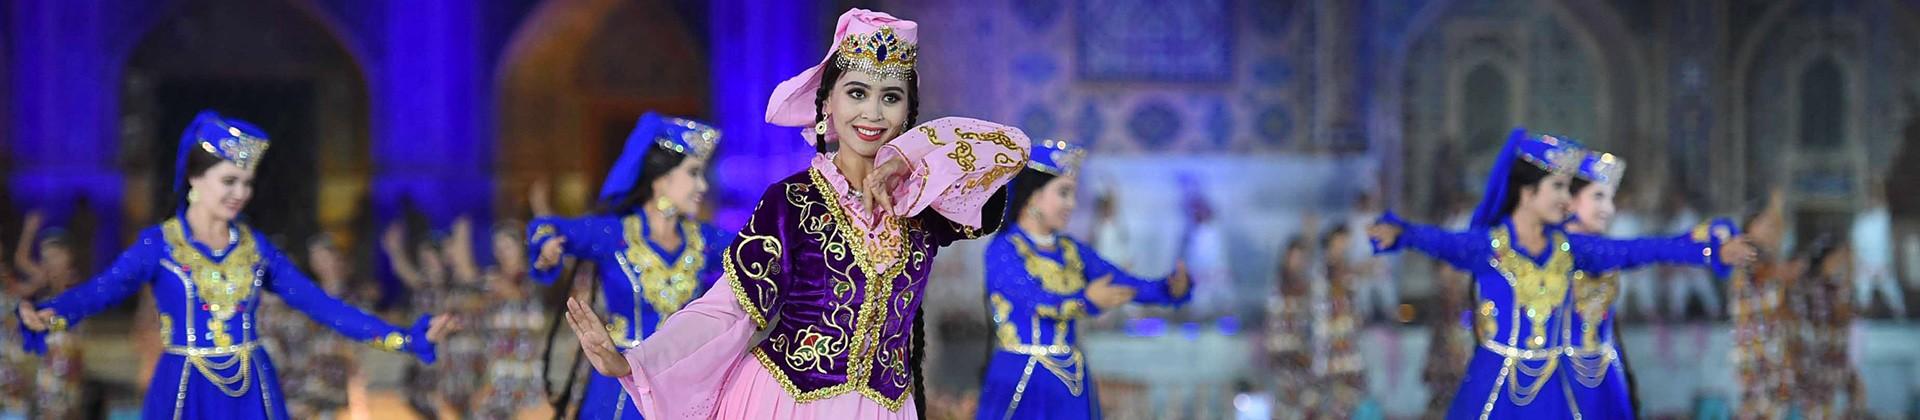 Holidays and Festivals in Uzbekistan - 1